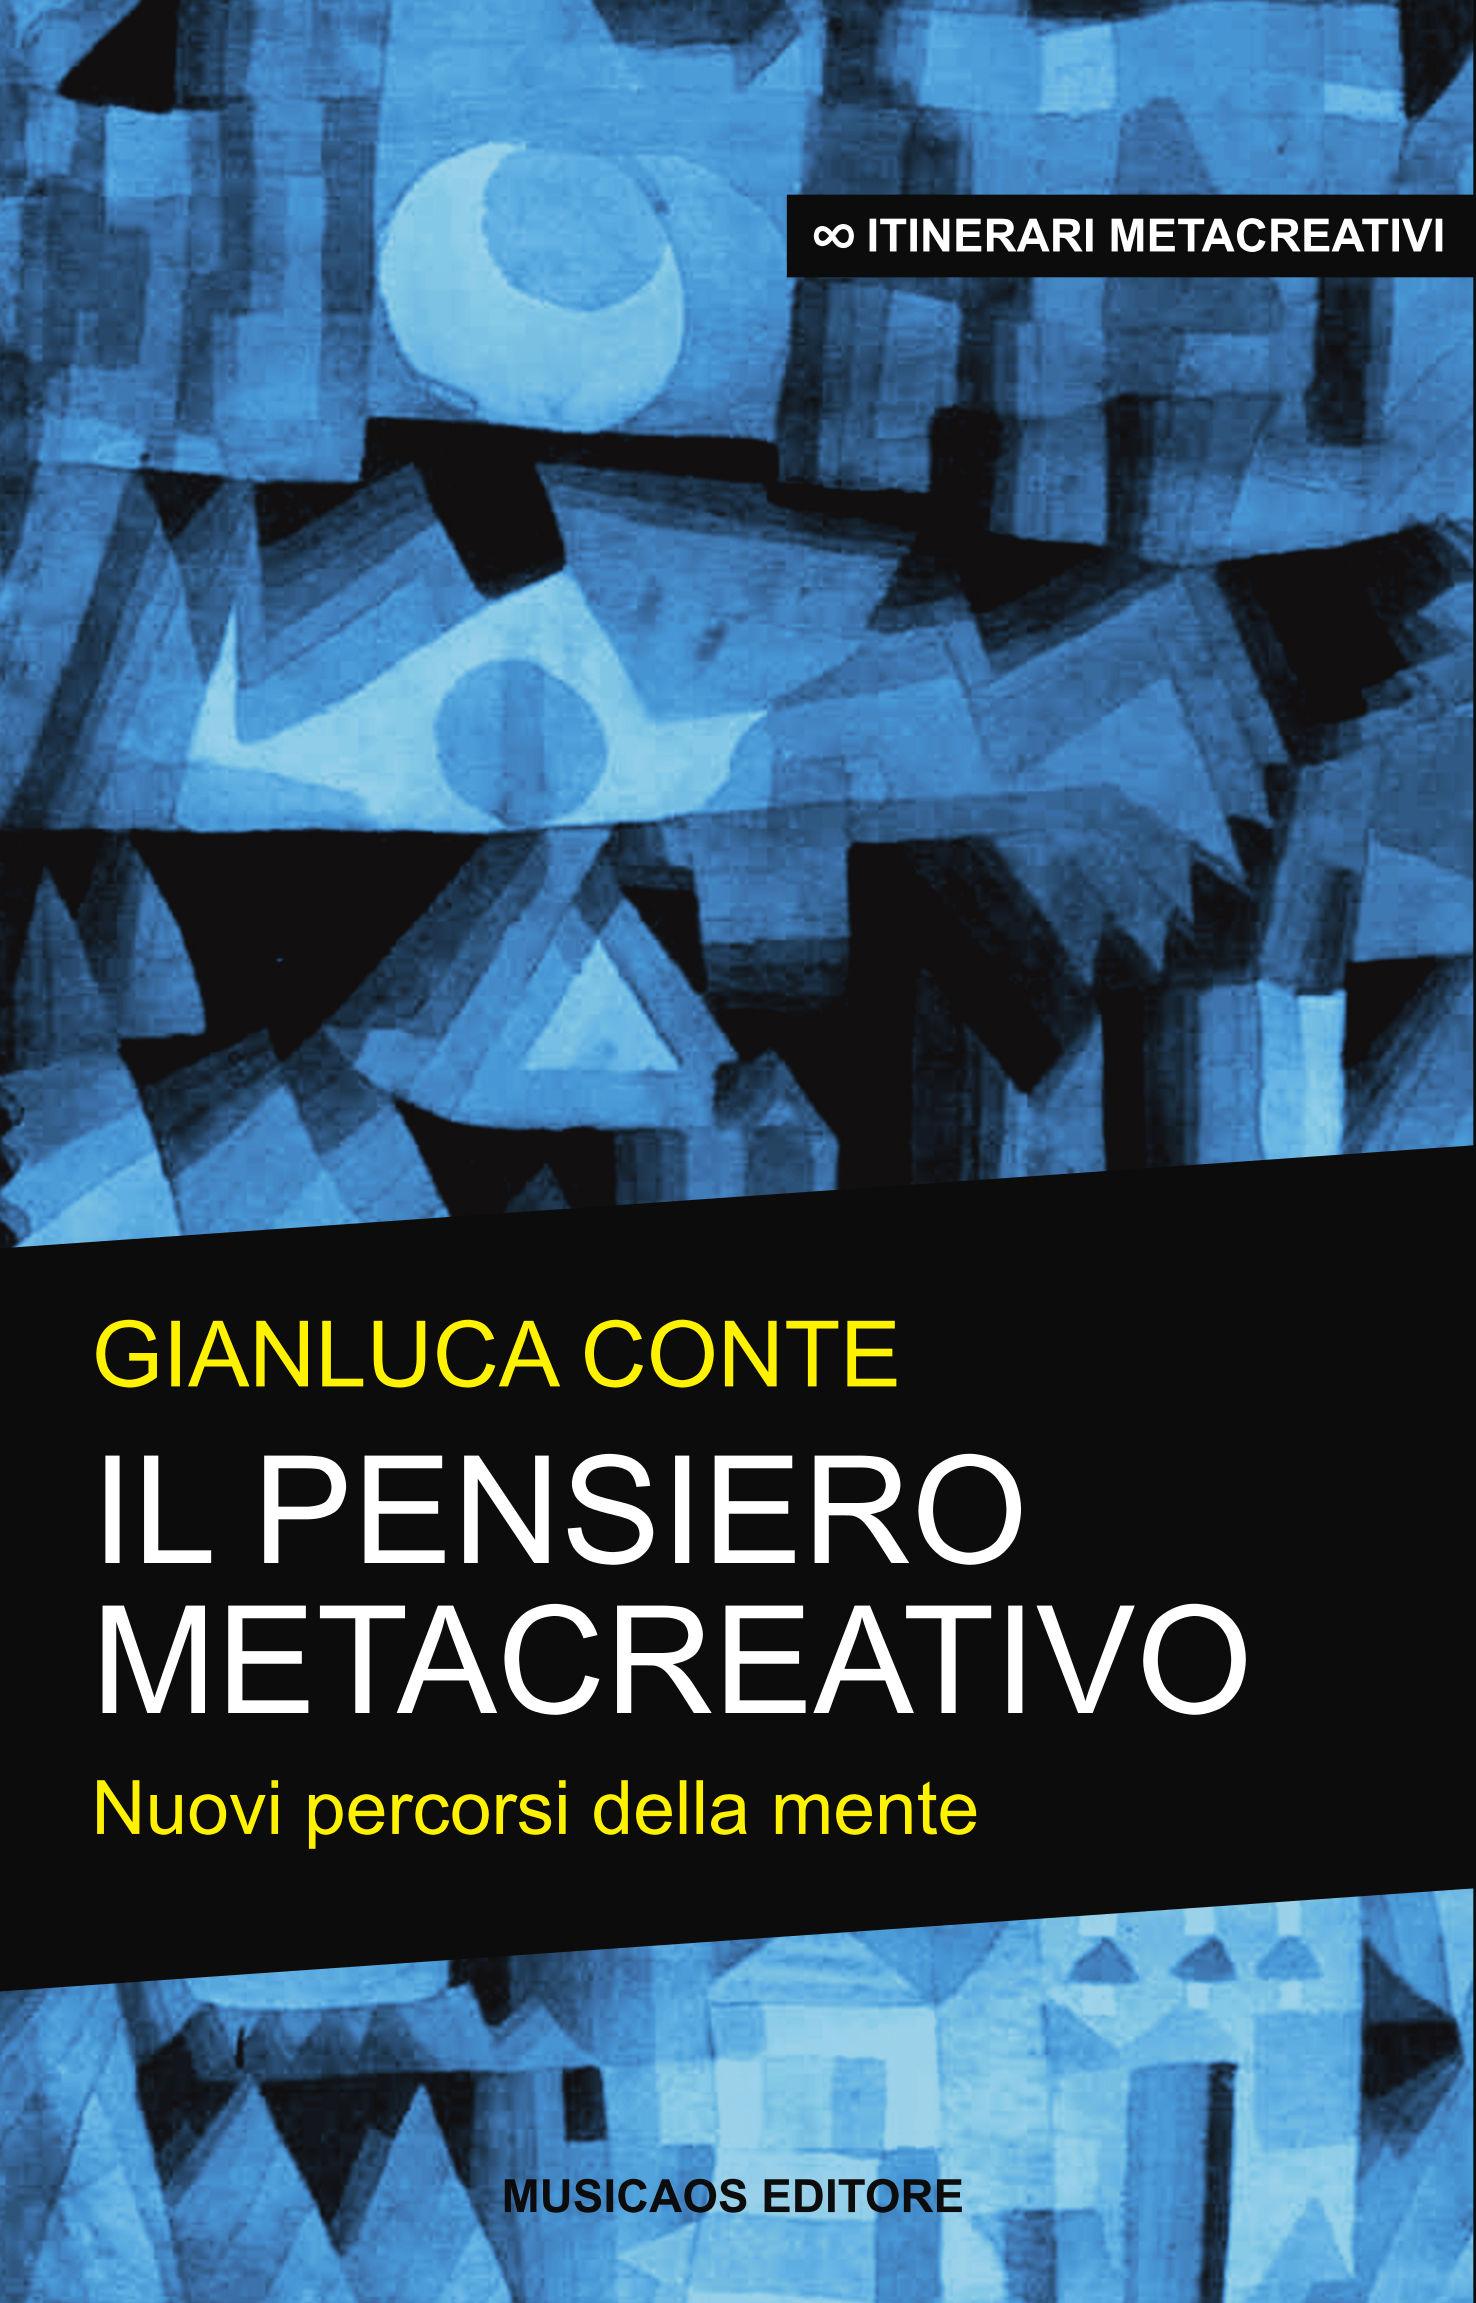 Gianluca Conte - Il pensiero metacreativo